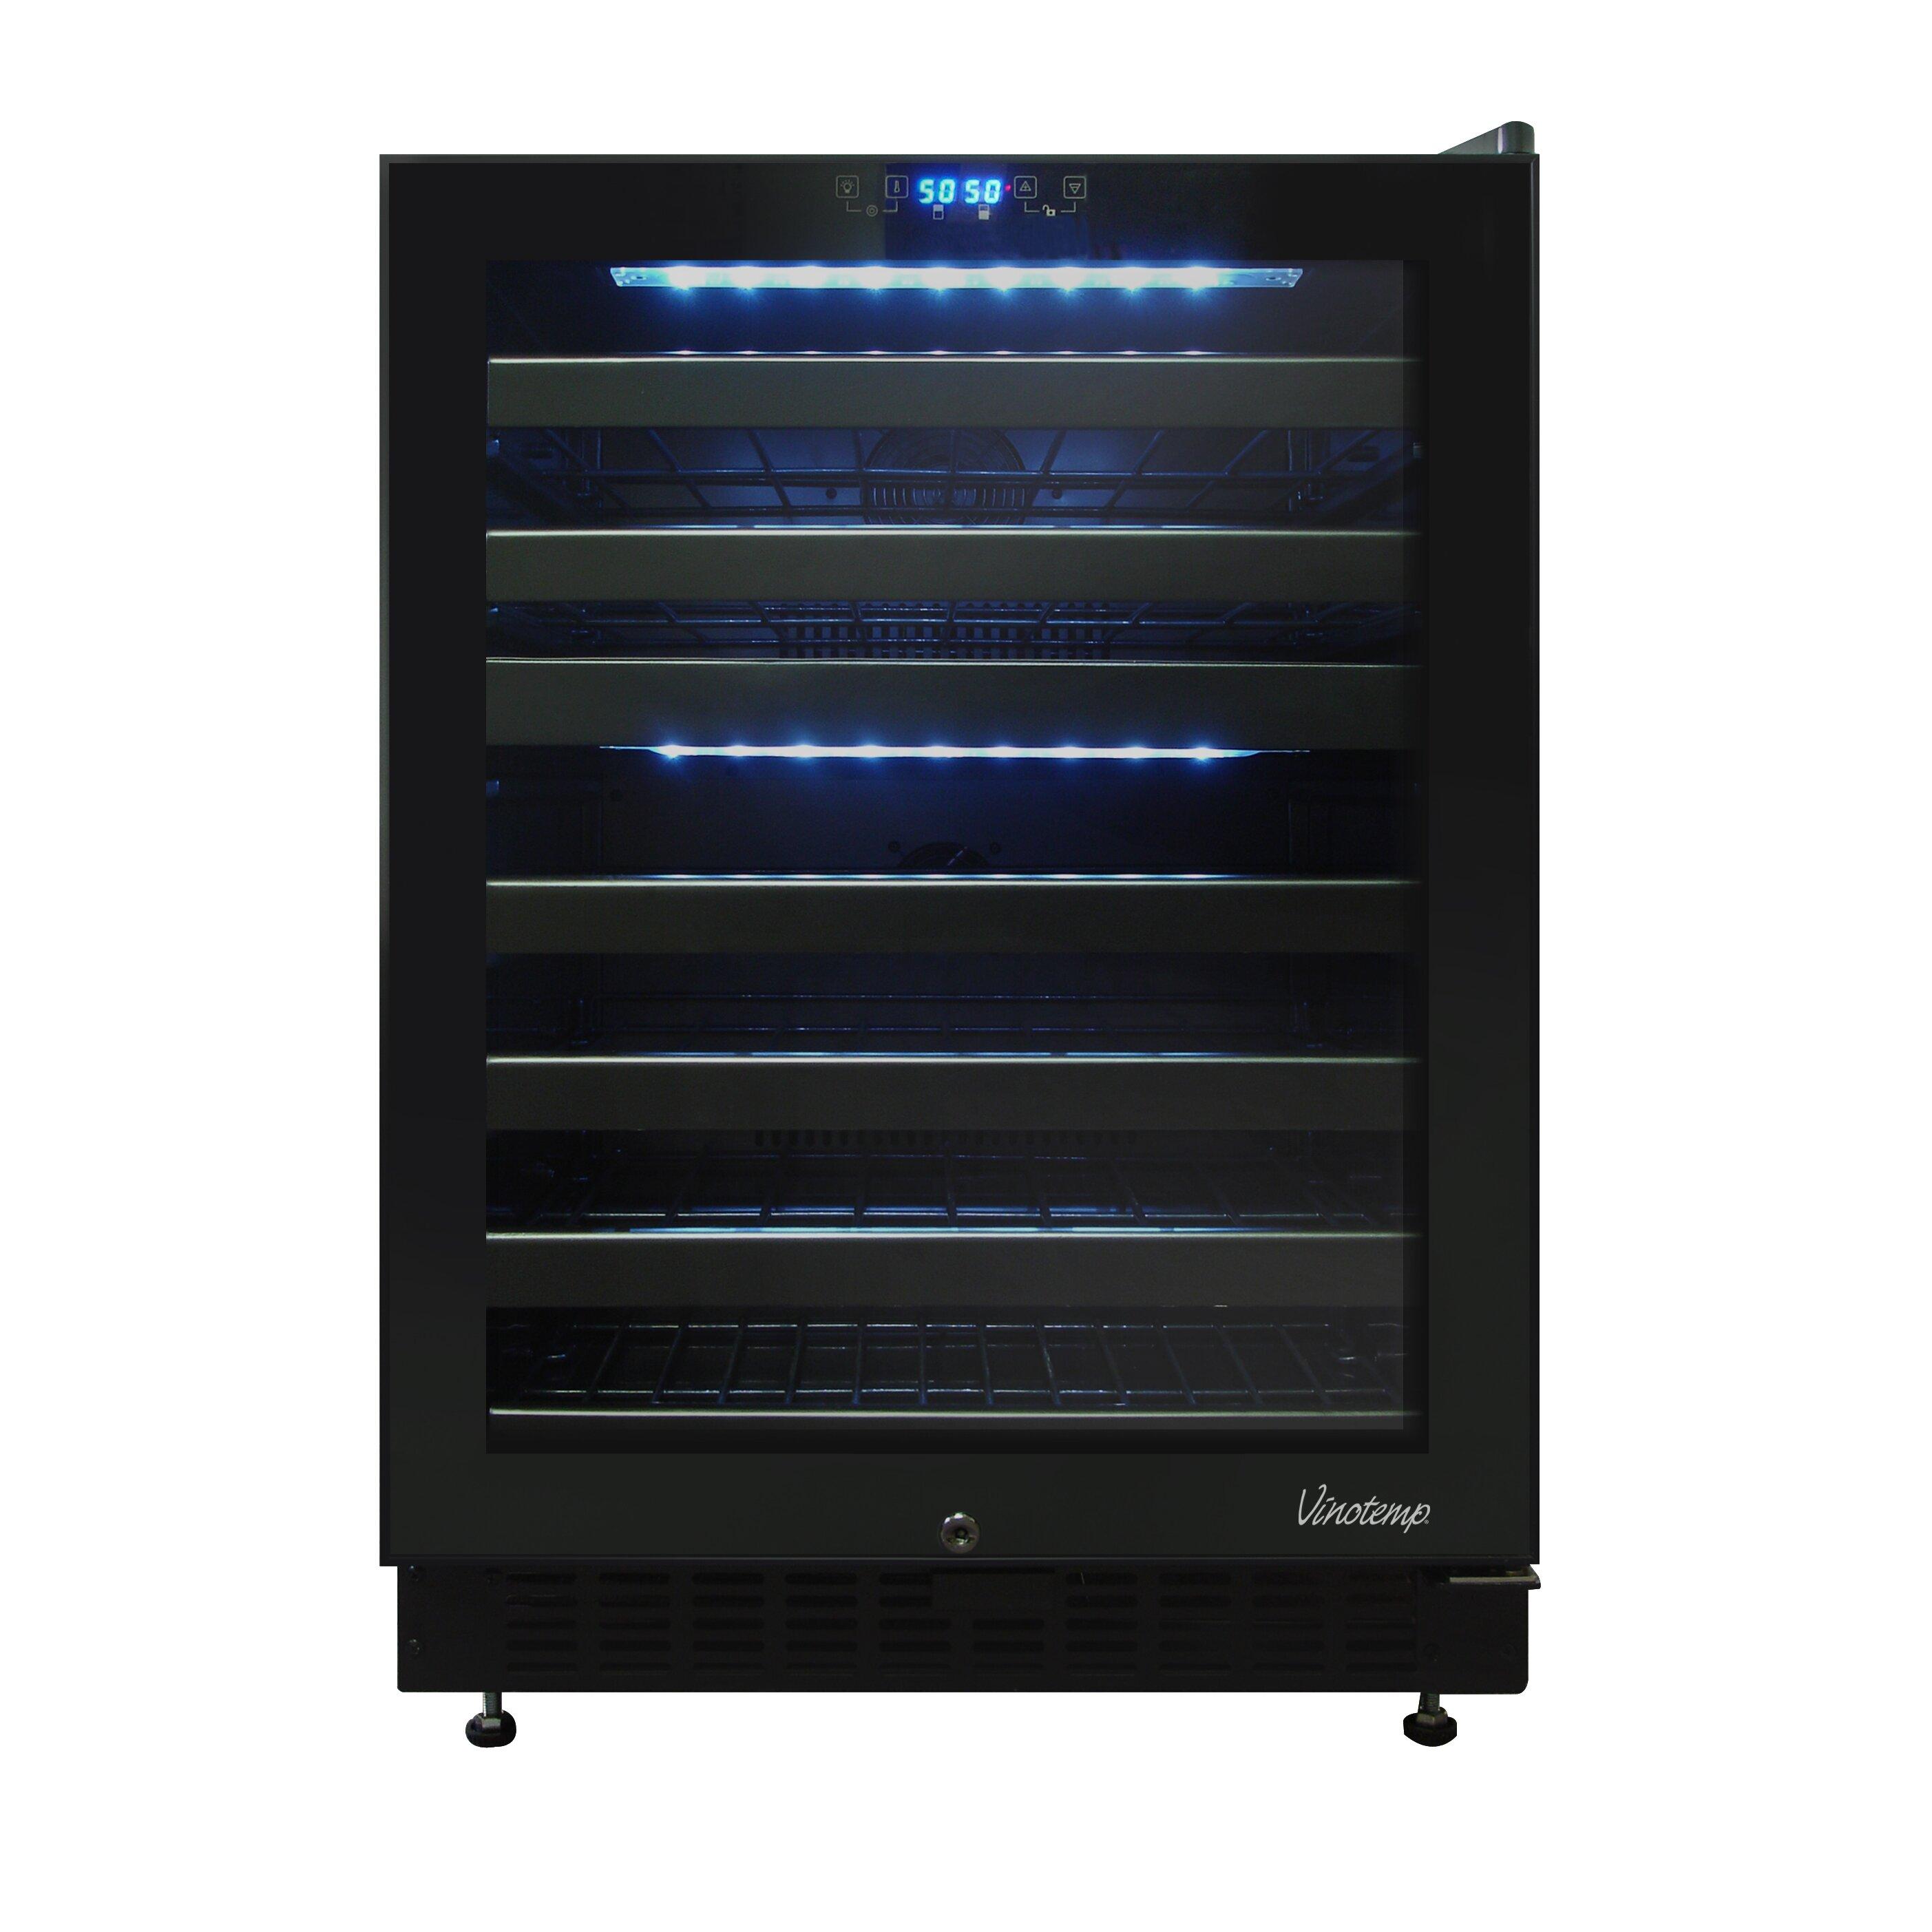 vinotemp 46 bottle dual zone built in wine refrigerator reviews wayfair. Black Bedroom Furniture Sets. Home Design Ideas